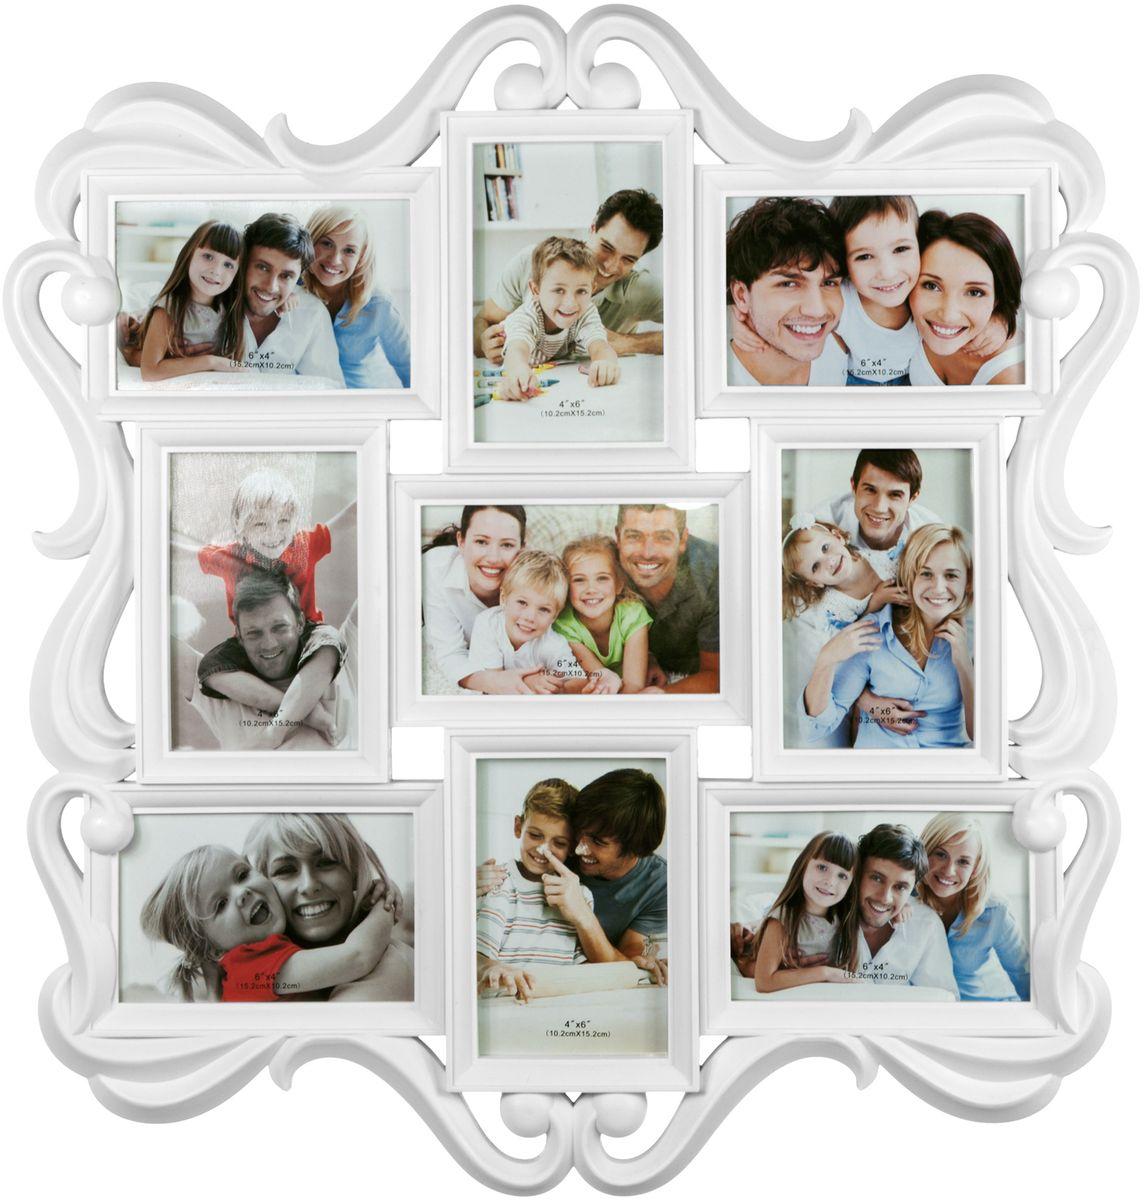 Фоторамка-коллаж Platinum, цвет: белый, 9 фоторамок. BIN-1122982-WBIN-1122982-WПластиковый коллаж с 9 фото 10 х 15 см.